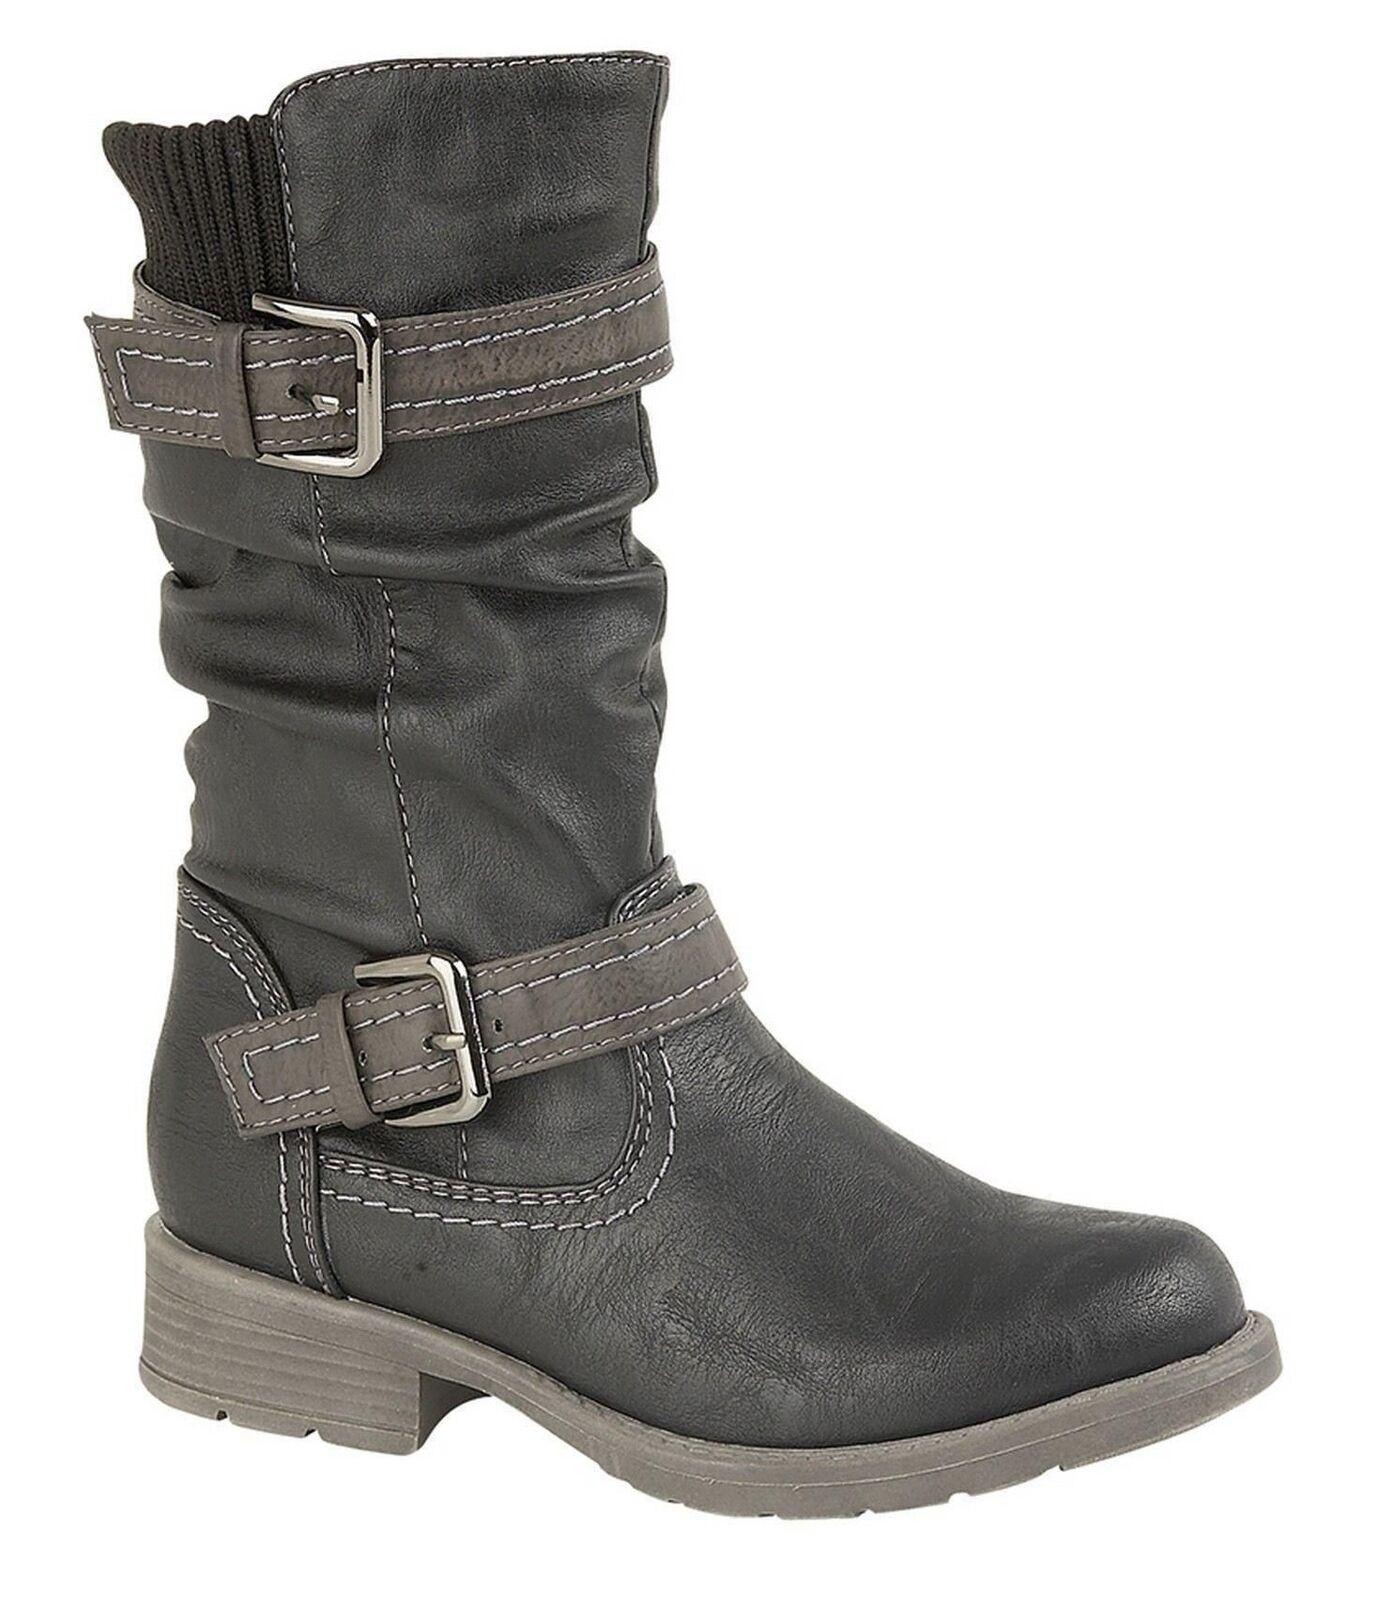 Boulevard G755A Girls High Leg Twin Buckle Zip Quilted Boots